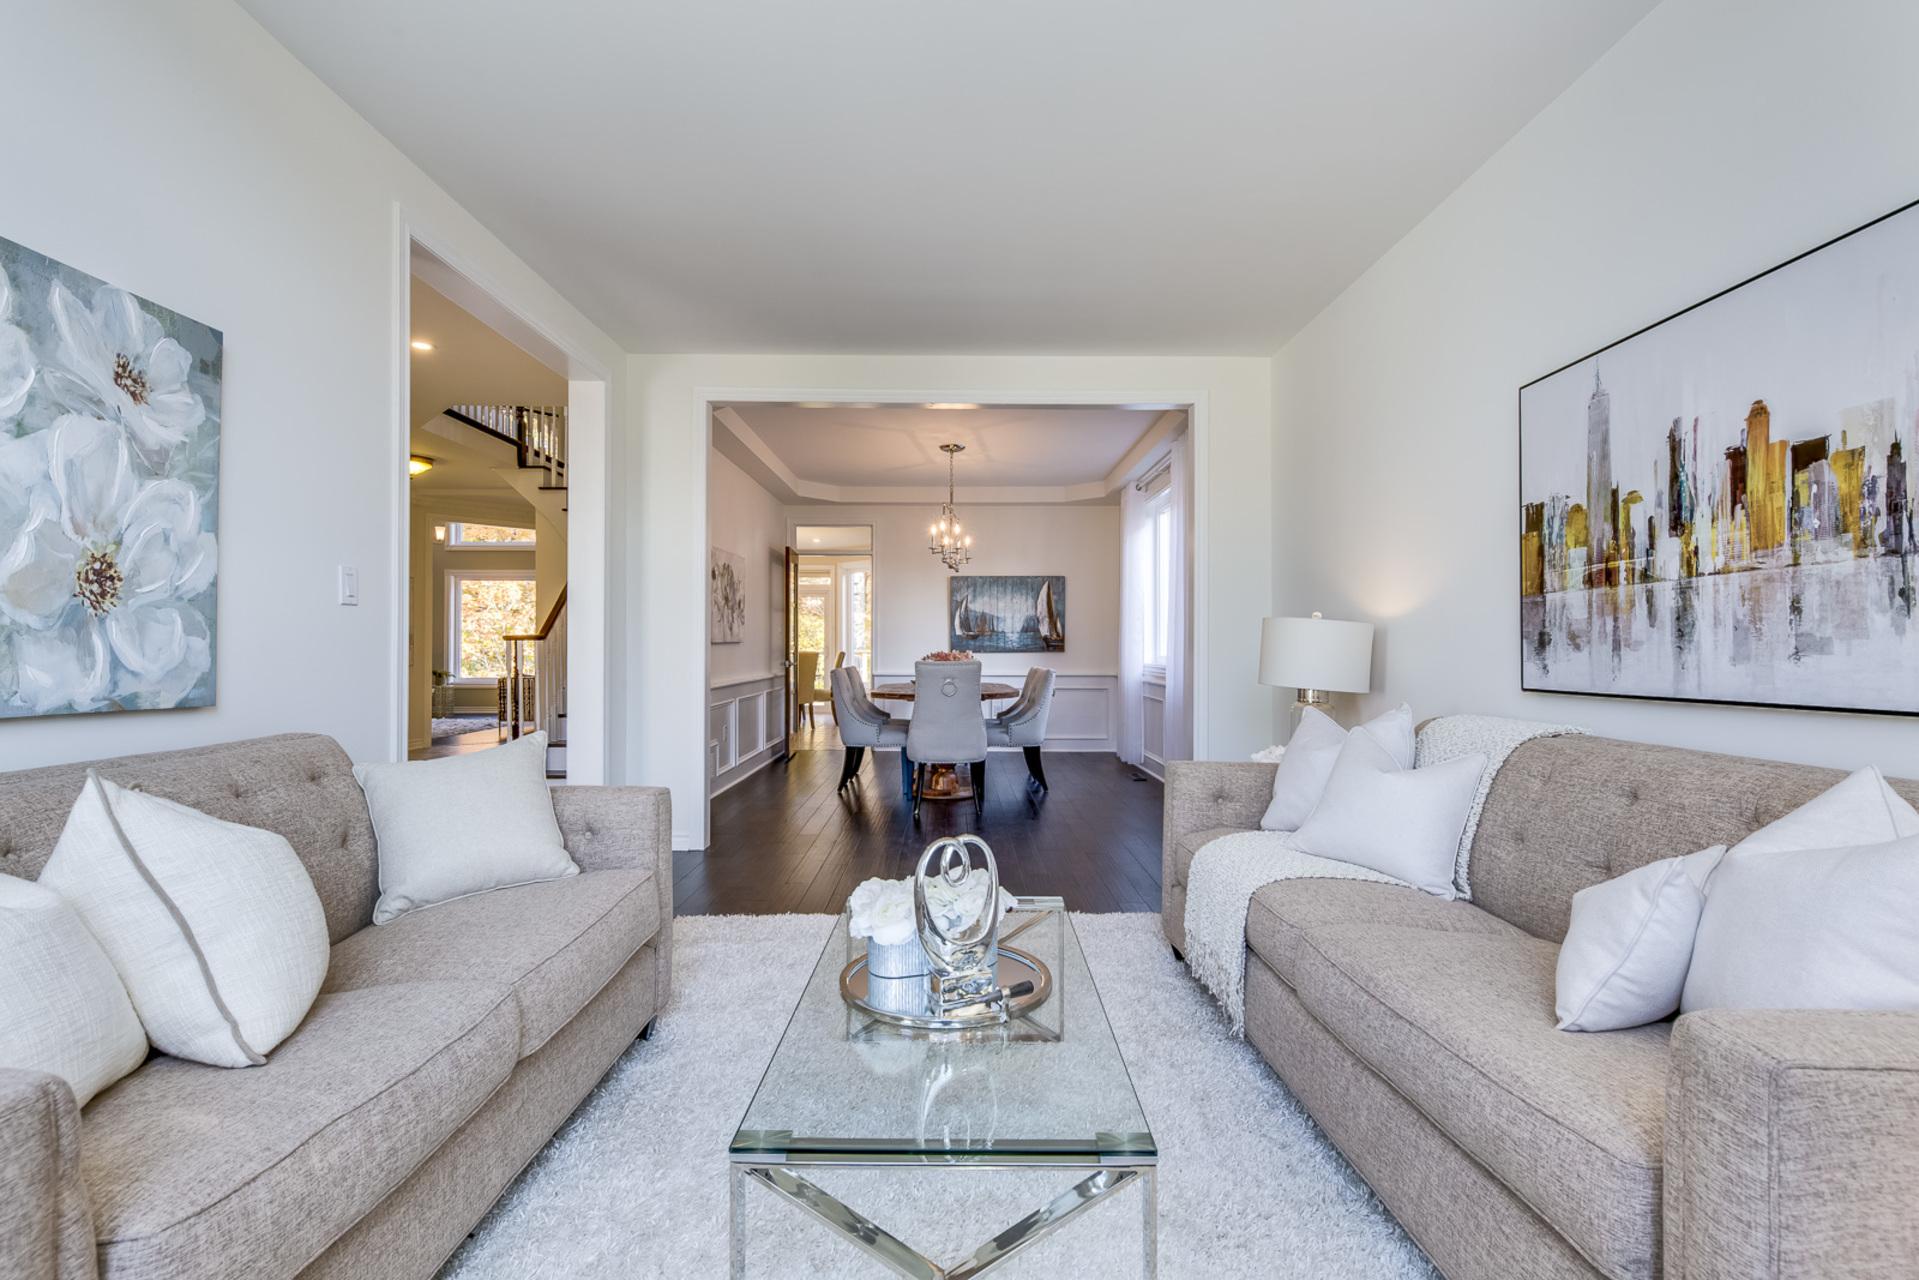 Living Room - 1806 Glenvista Dr, Oakville - Elite3 & Team at  Glenvista Drive, Iroquois Ridge North, Oakville